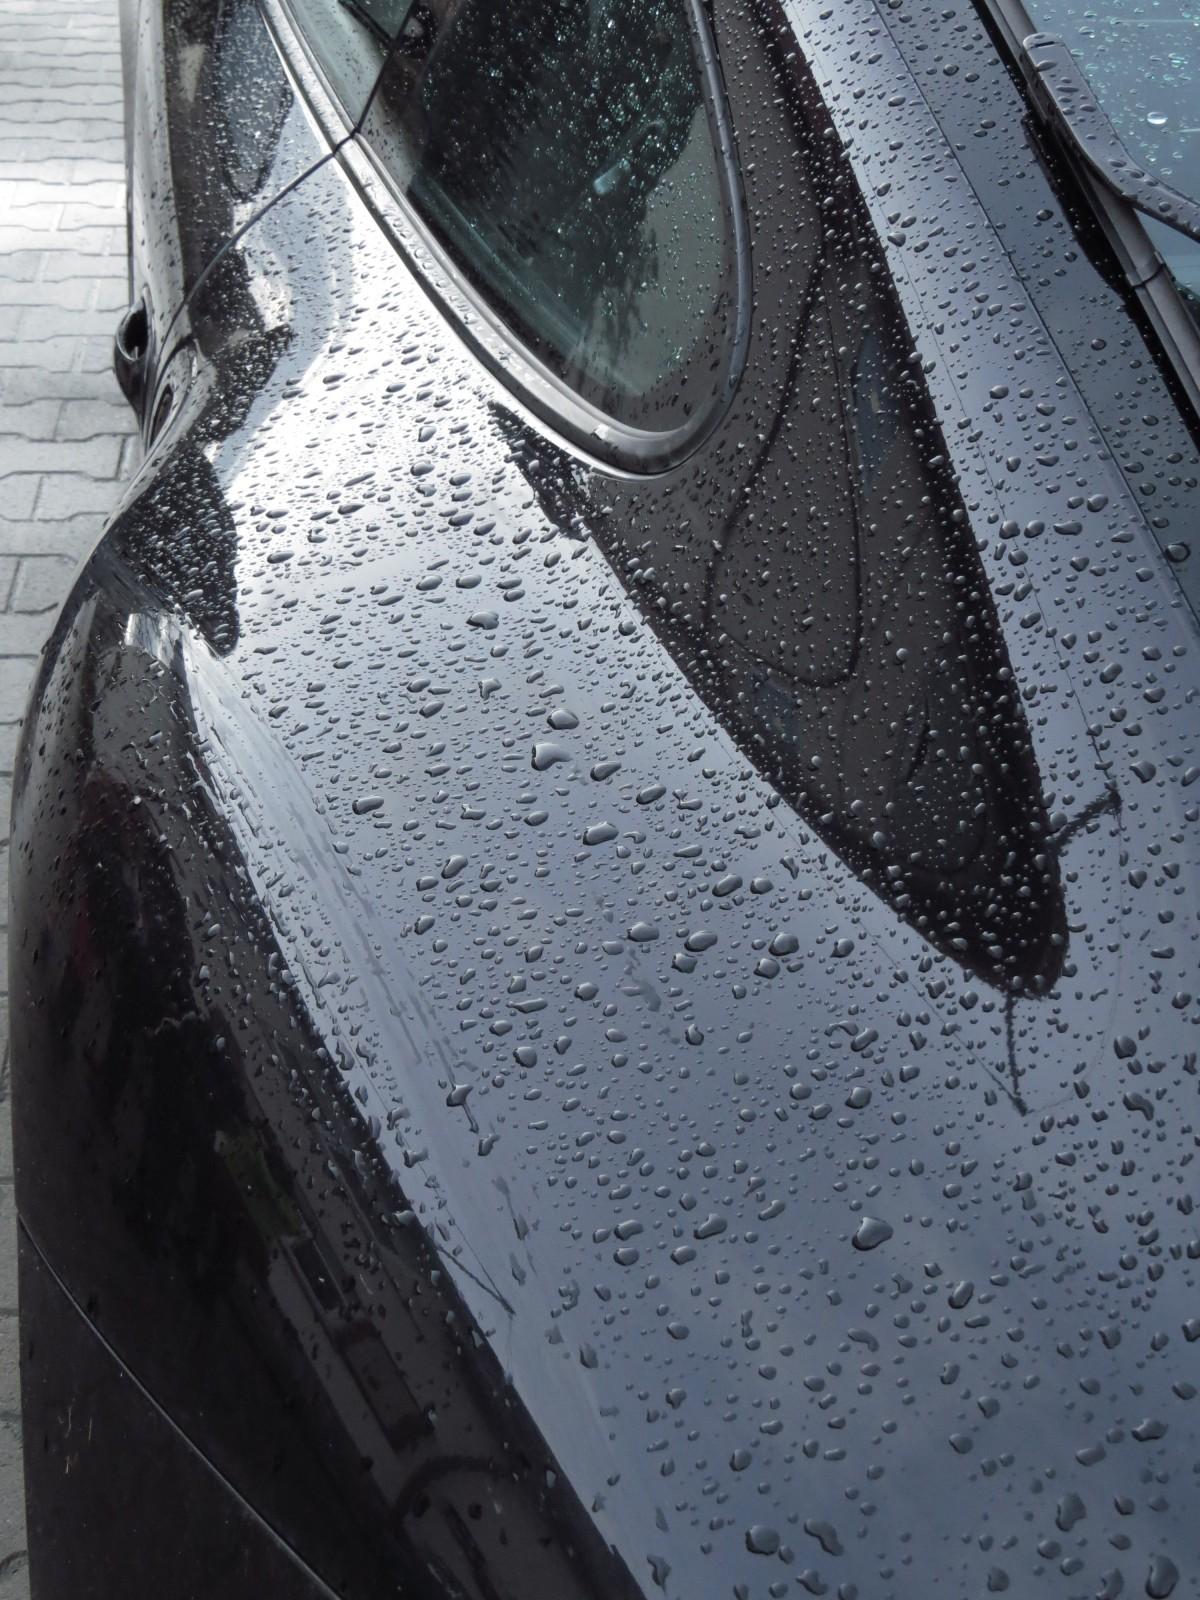 Free Images Drop Rain Floor Raindrop Wet Asphalt